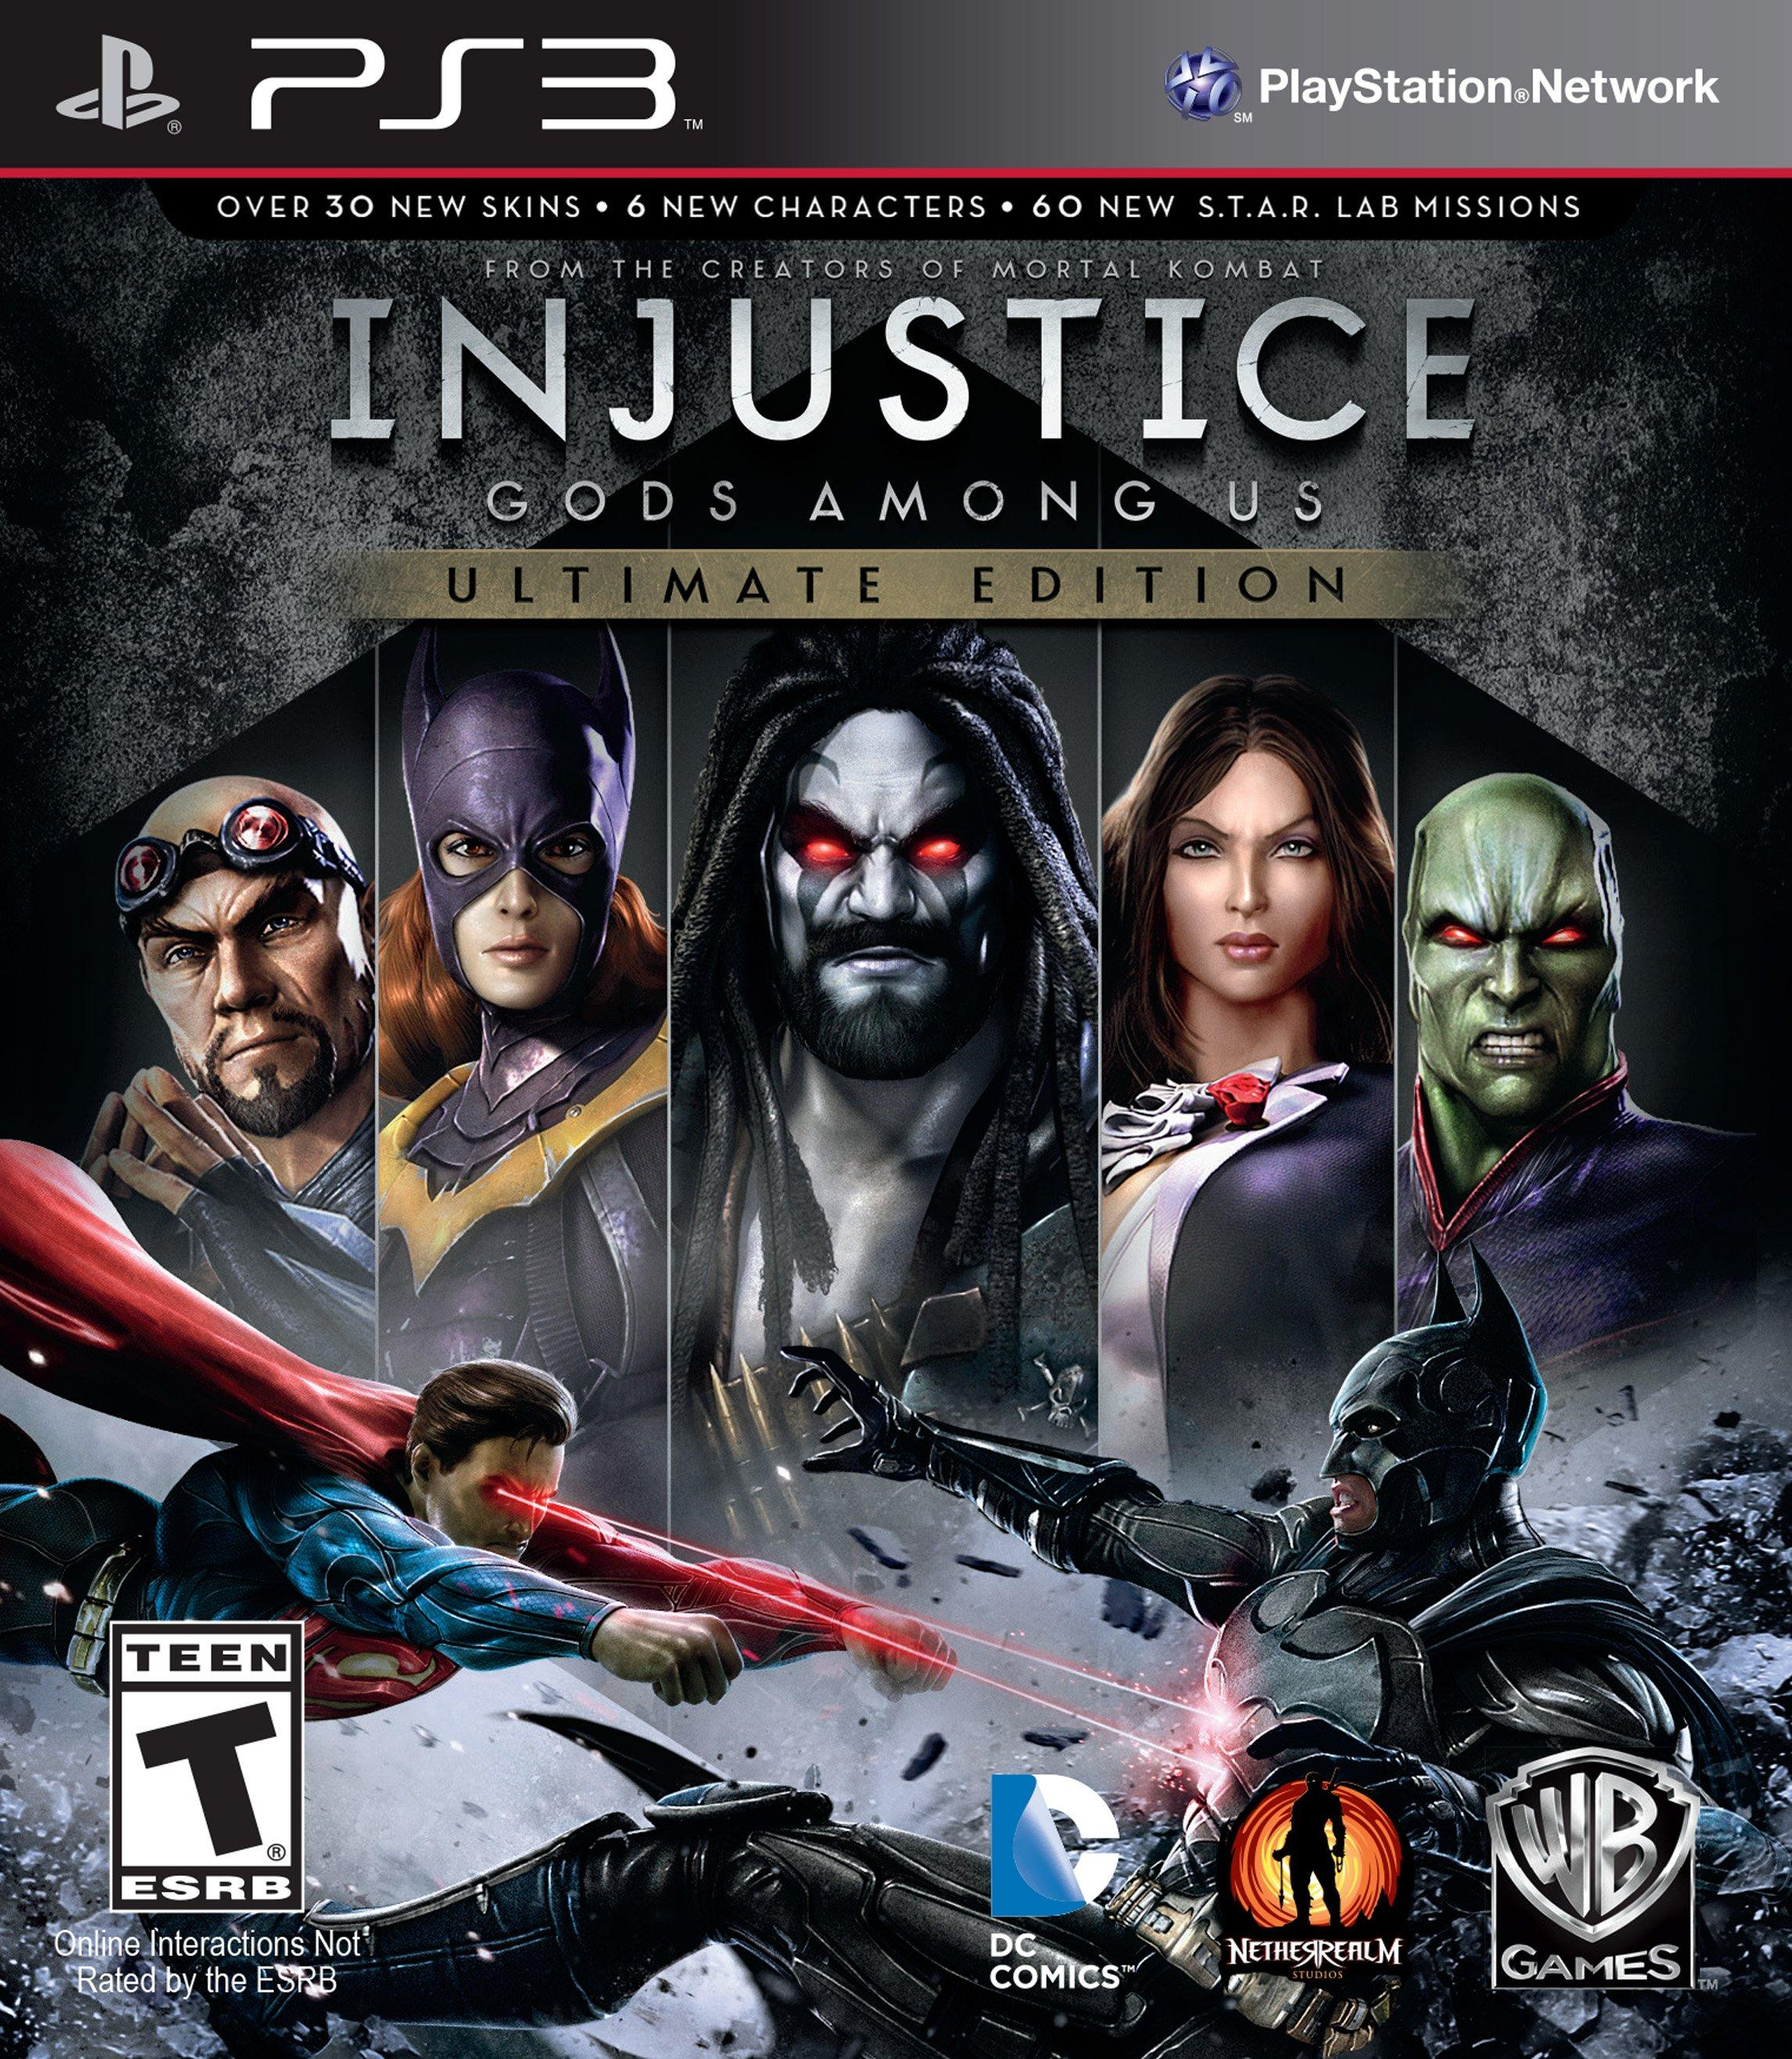 Injustice: Gods Among Us Ultimate Edition | PlayStation 3 | GameStop